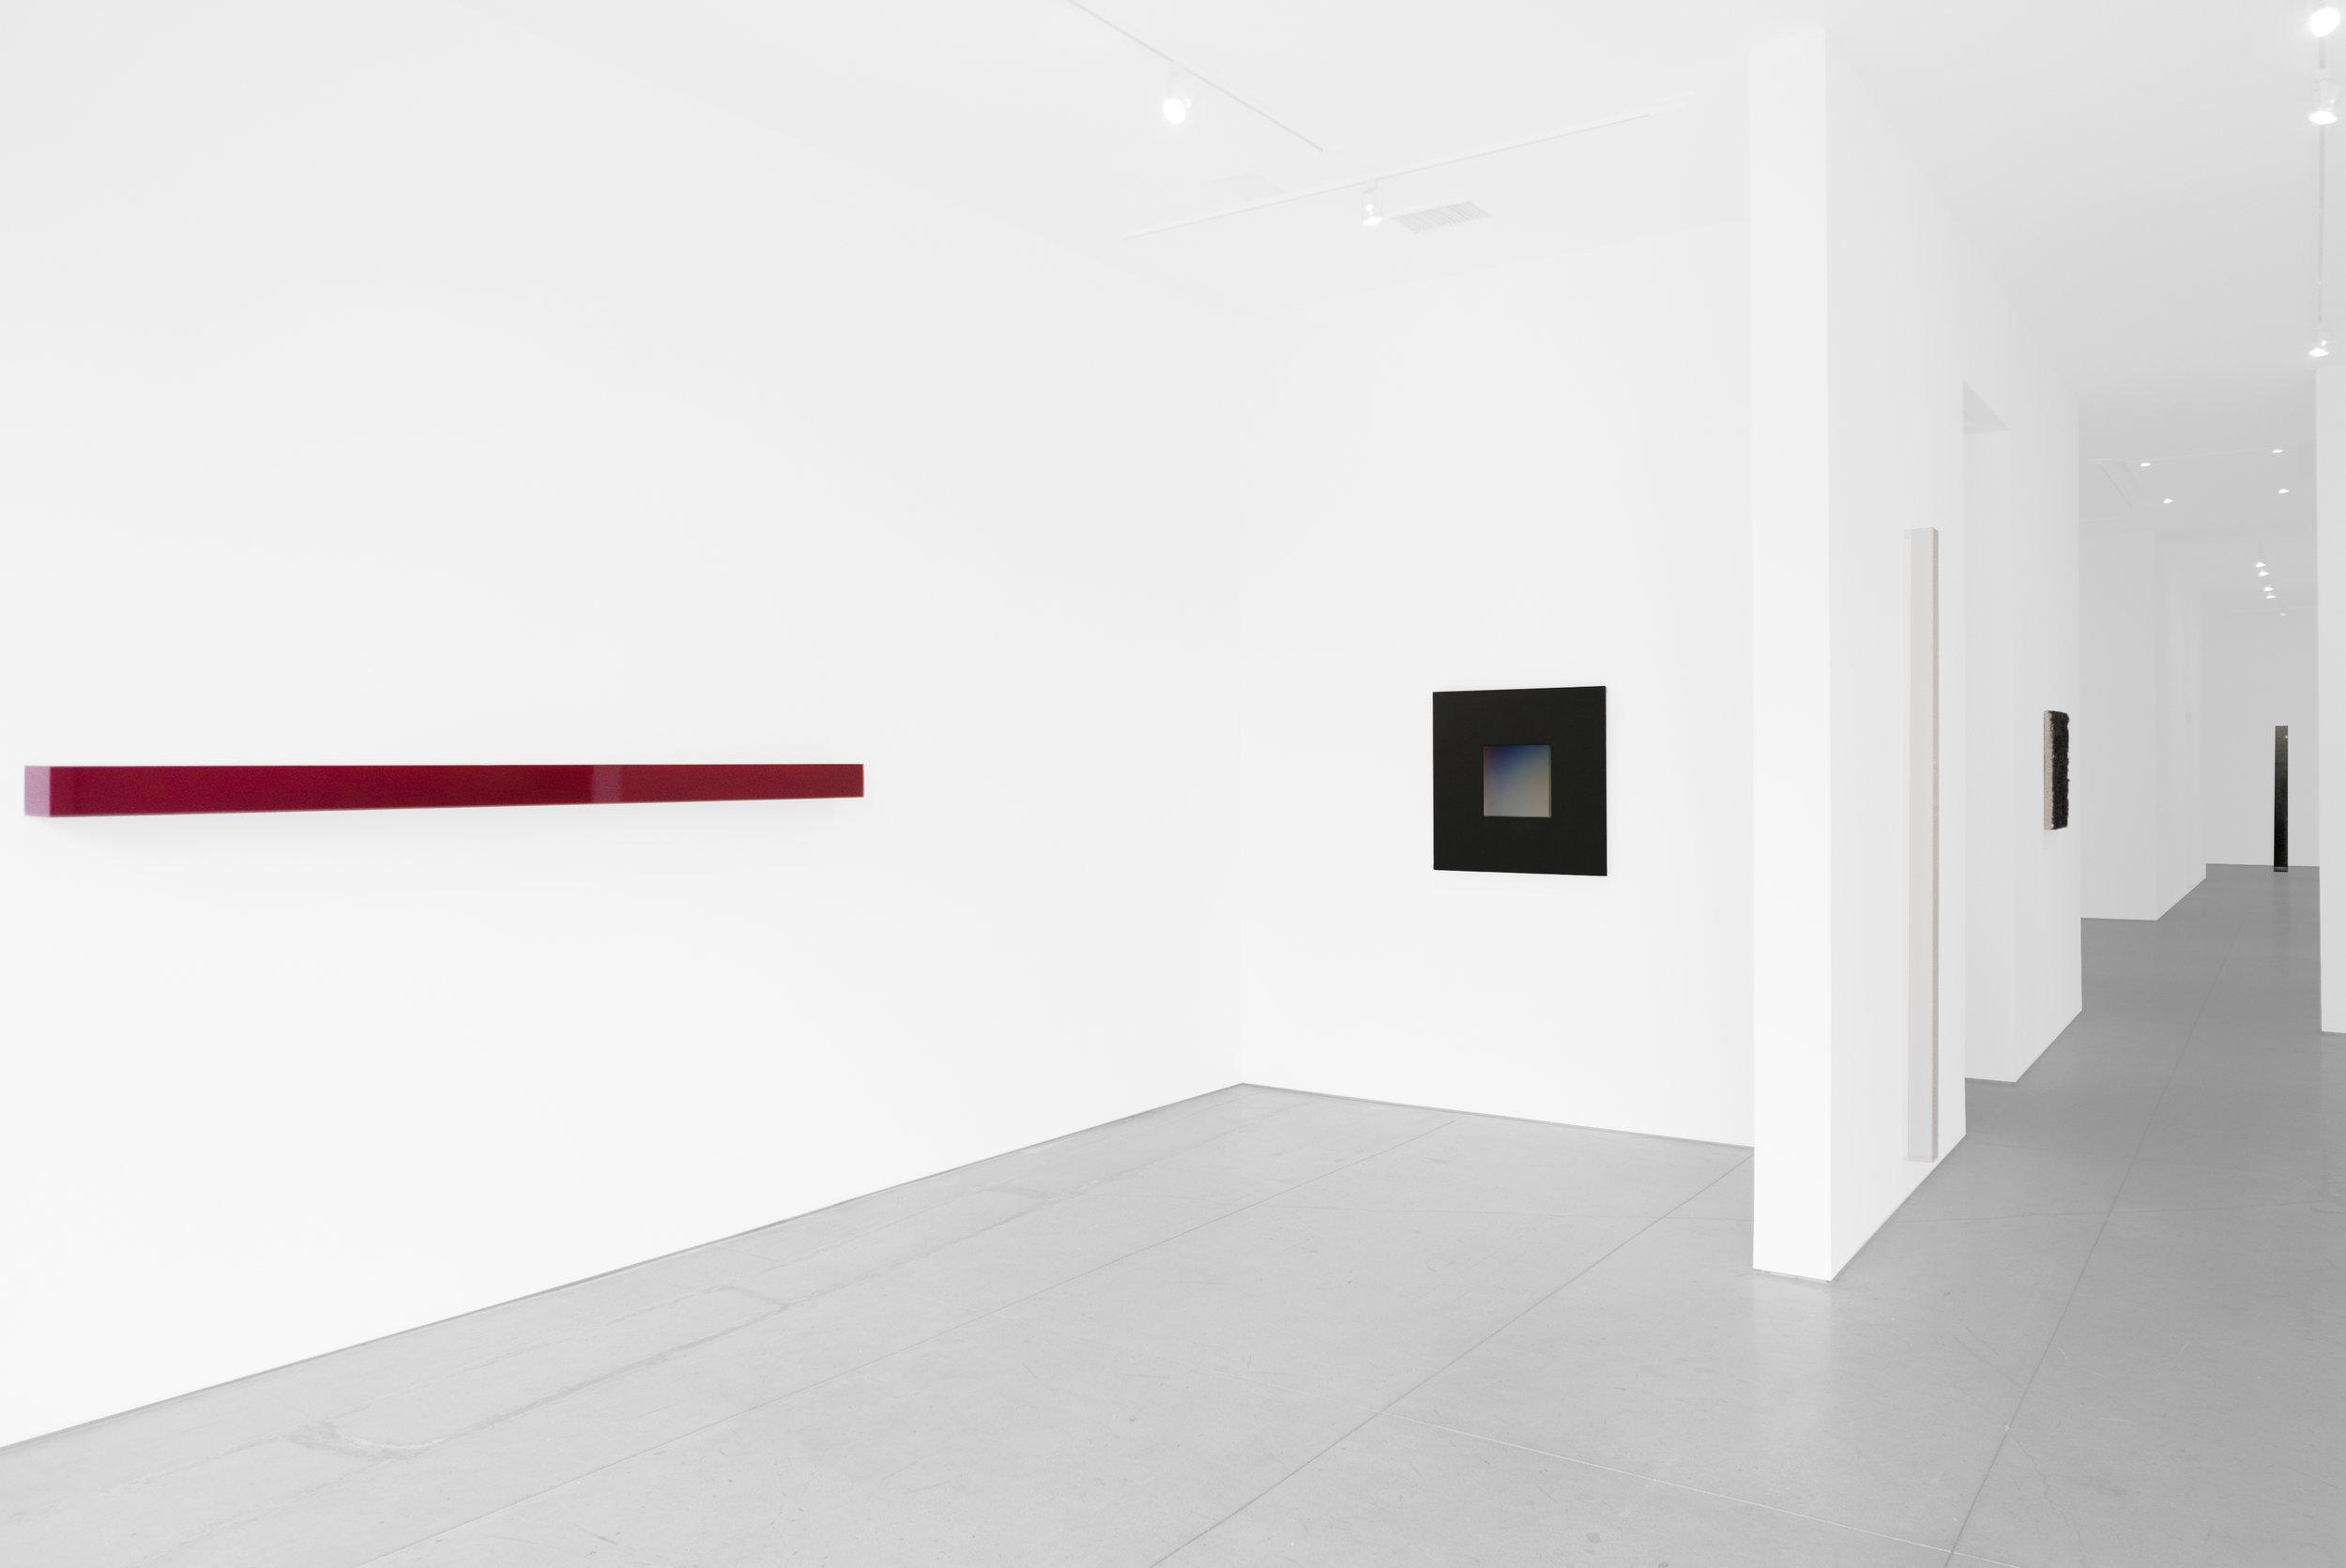 25 Years_Peter Blake Gallery_2019_Installation View_4.jpg